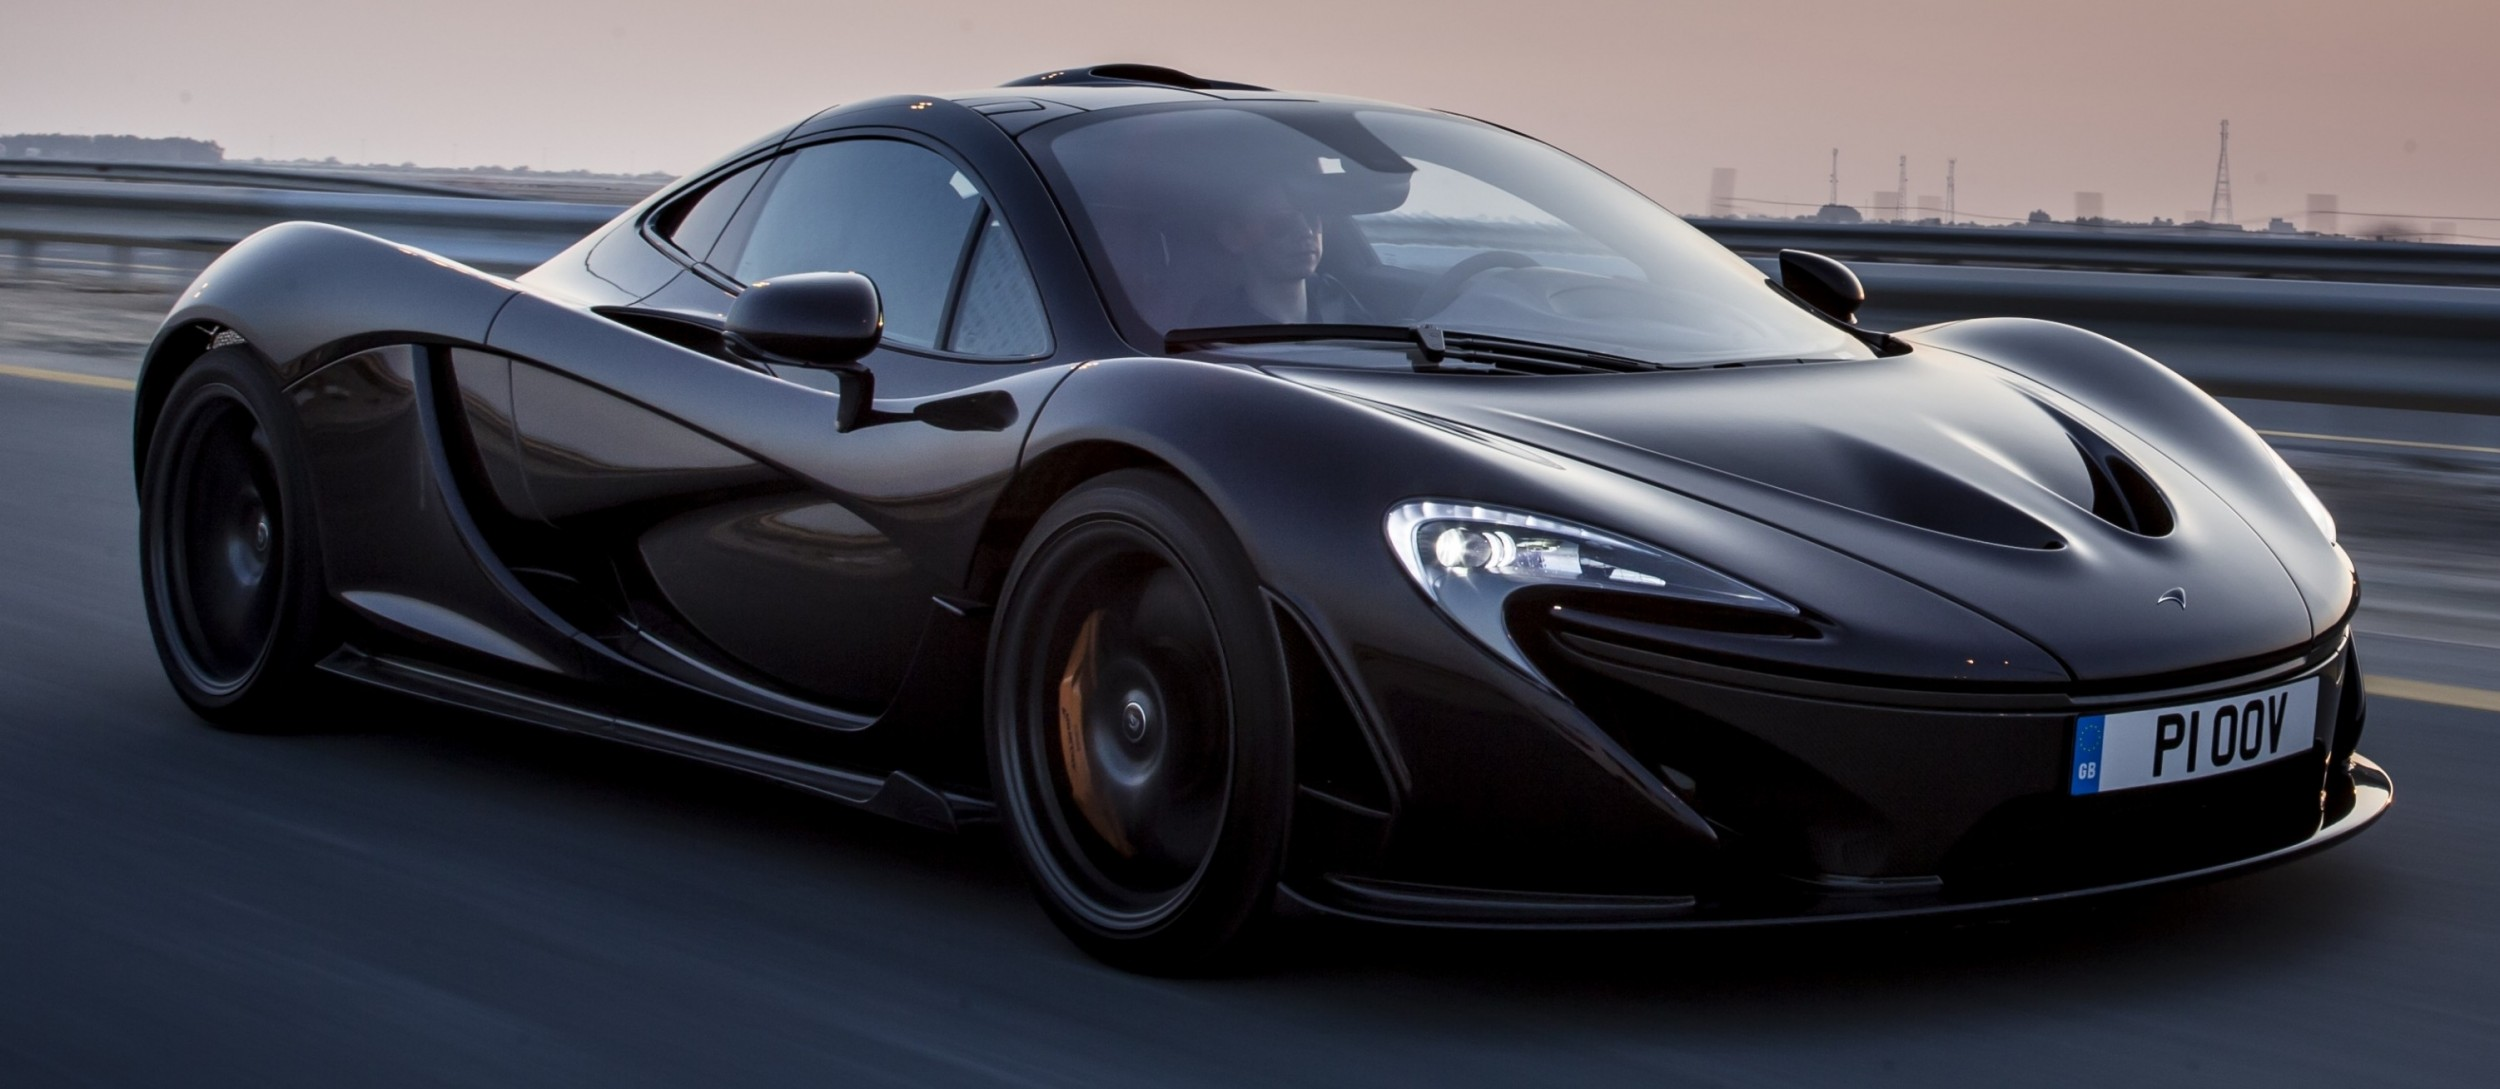 ferrari laferrari vs mclaren p1 technical specifications 2017 2018 cars reviews. Black Bedroom Furniture Sets. Home Design Ideas